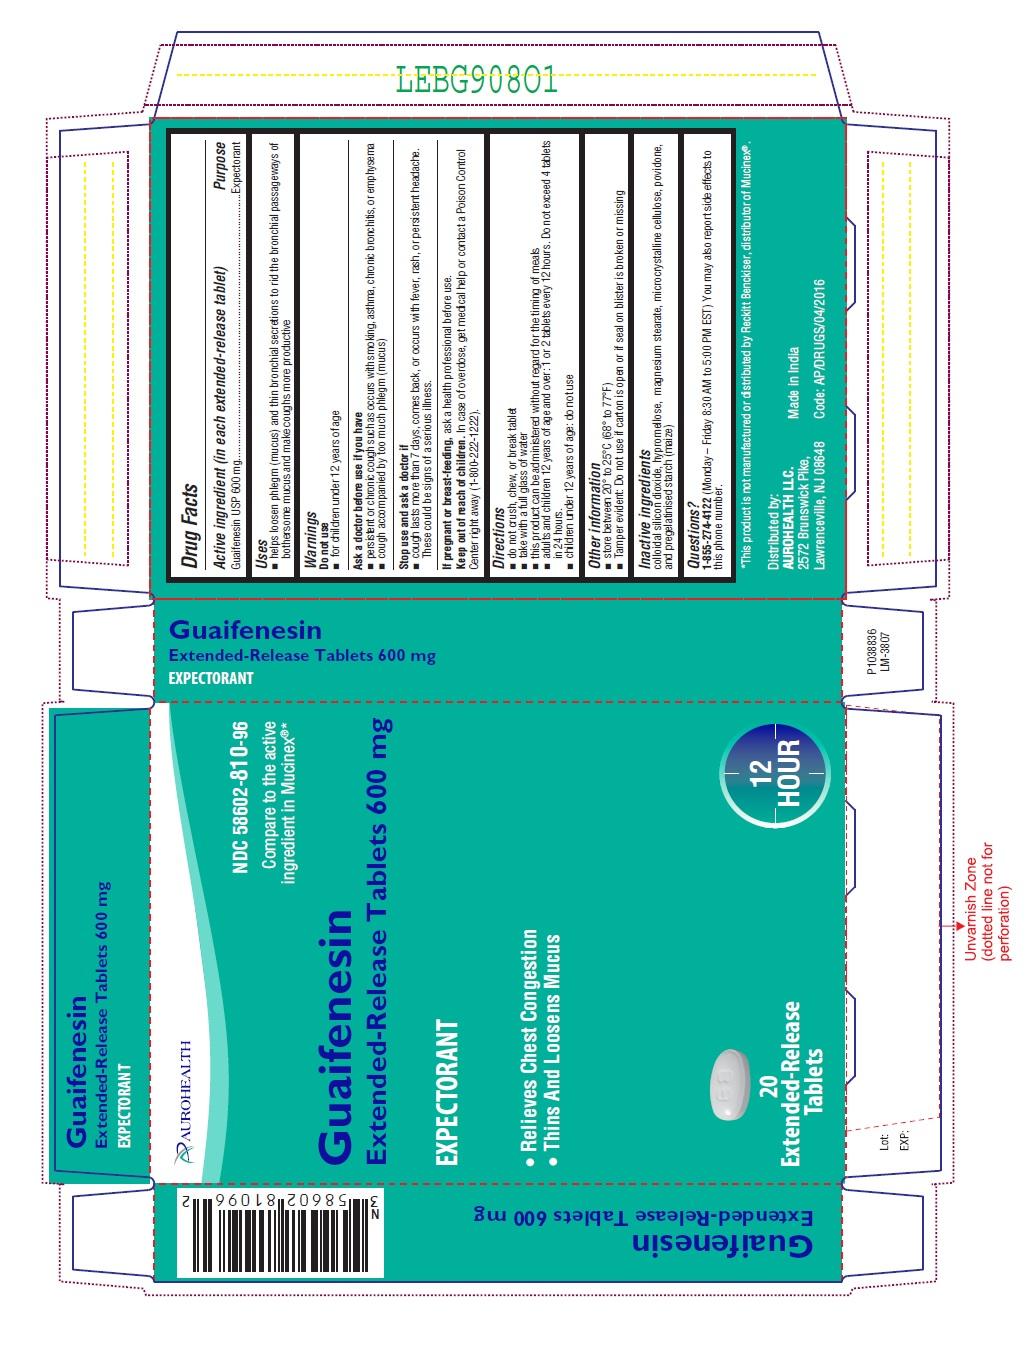 PACKAGE LABEL-PRINCIPAL DISPLAY PANEL - 600 mg Blister Carton (20 (1 x 20) Tablets)